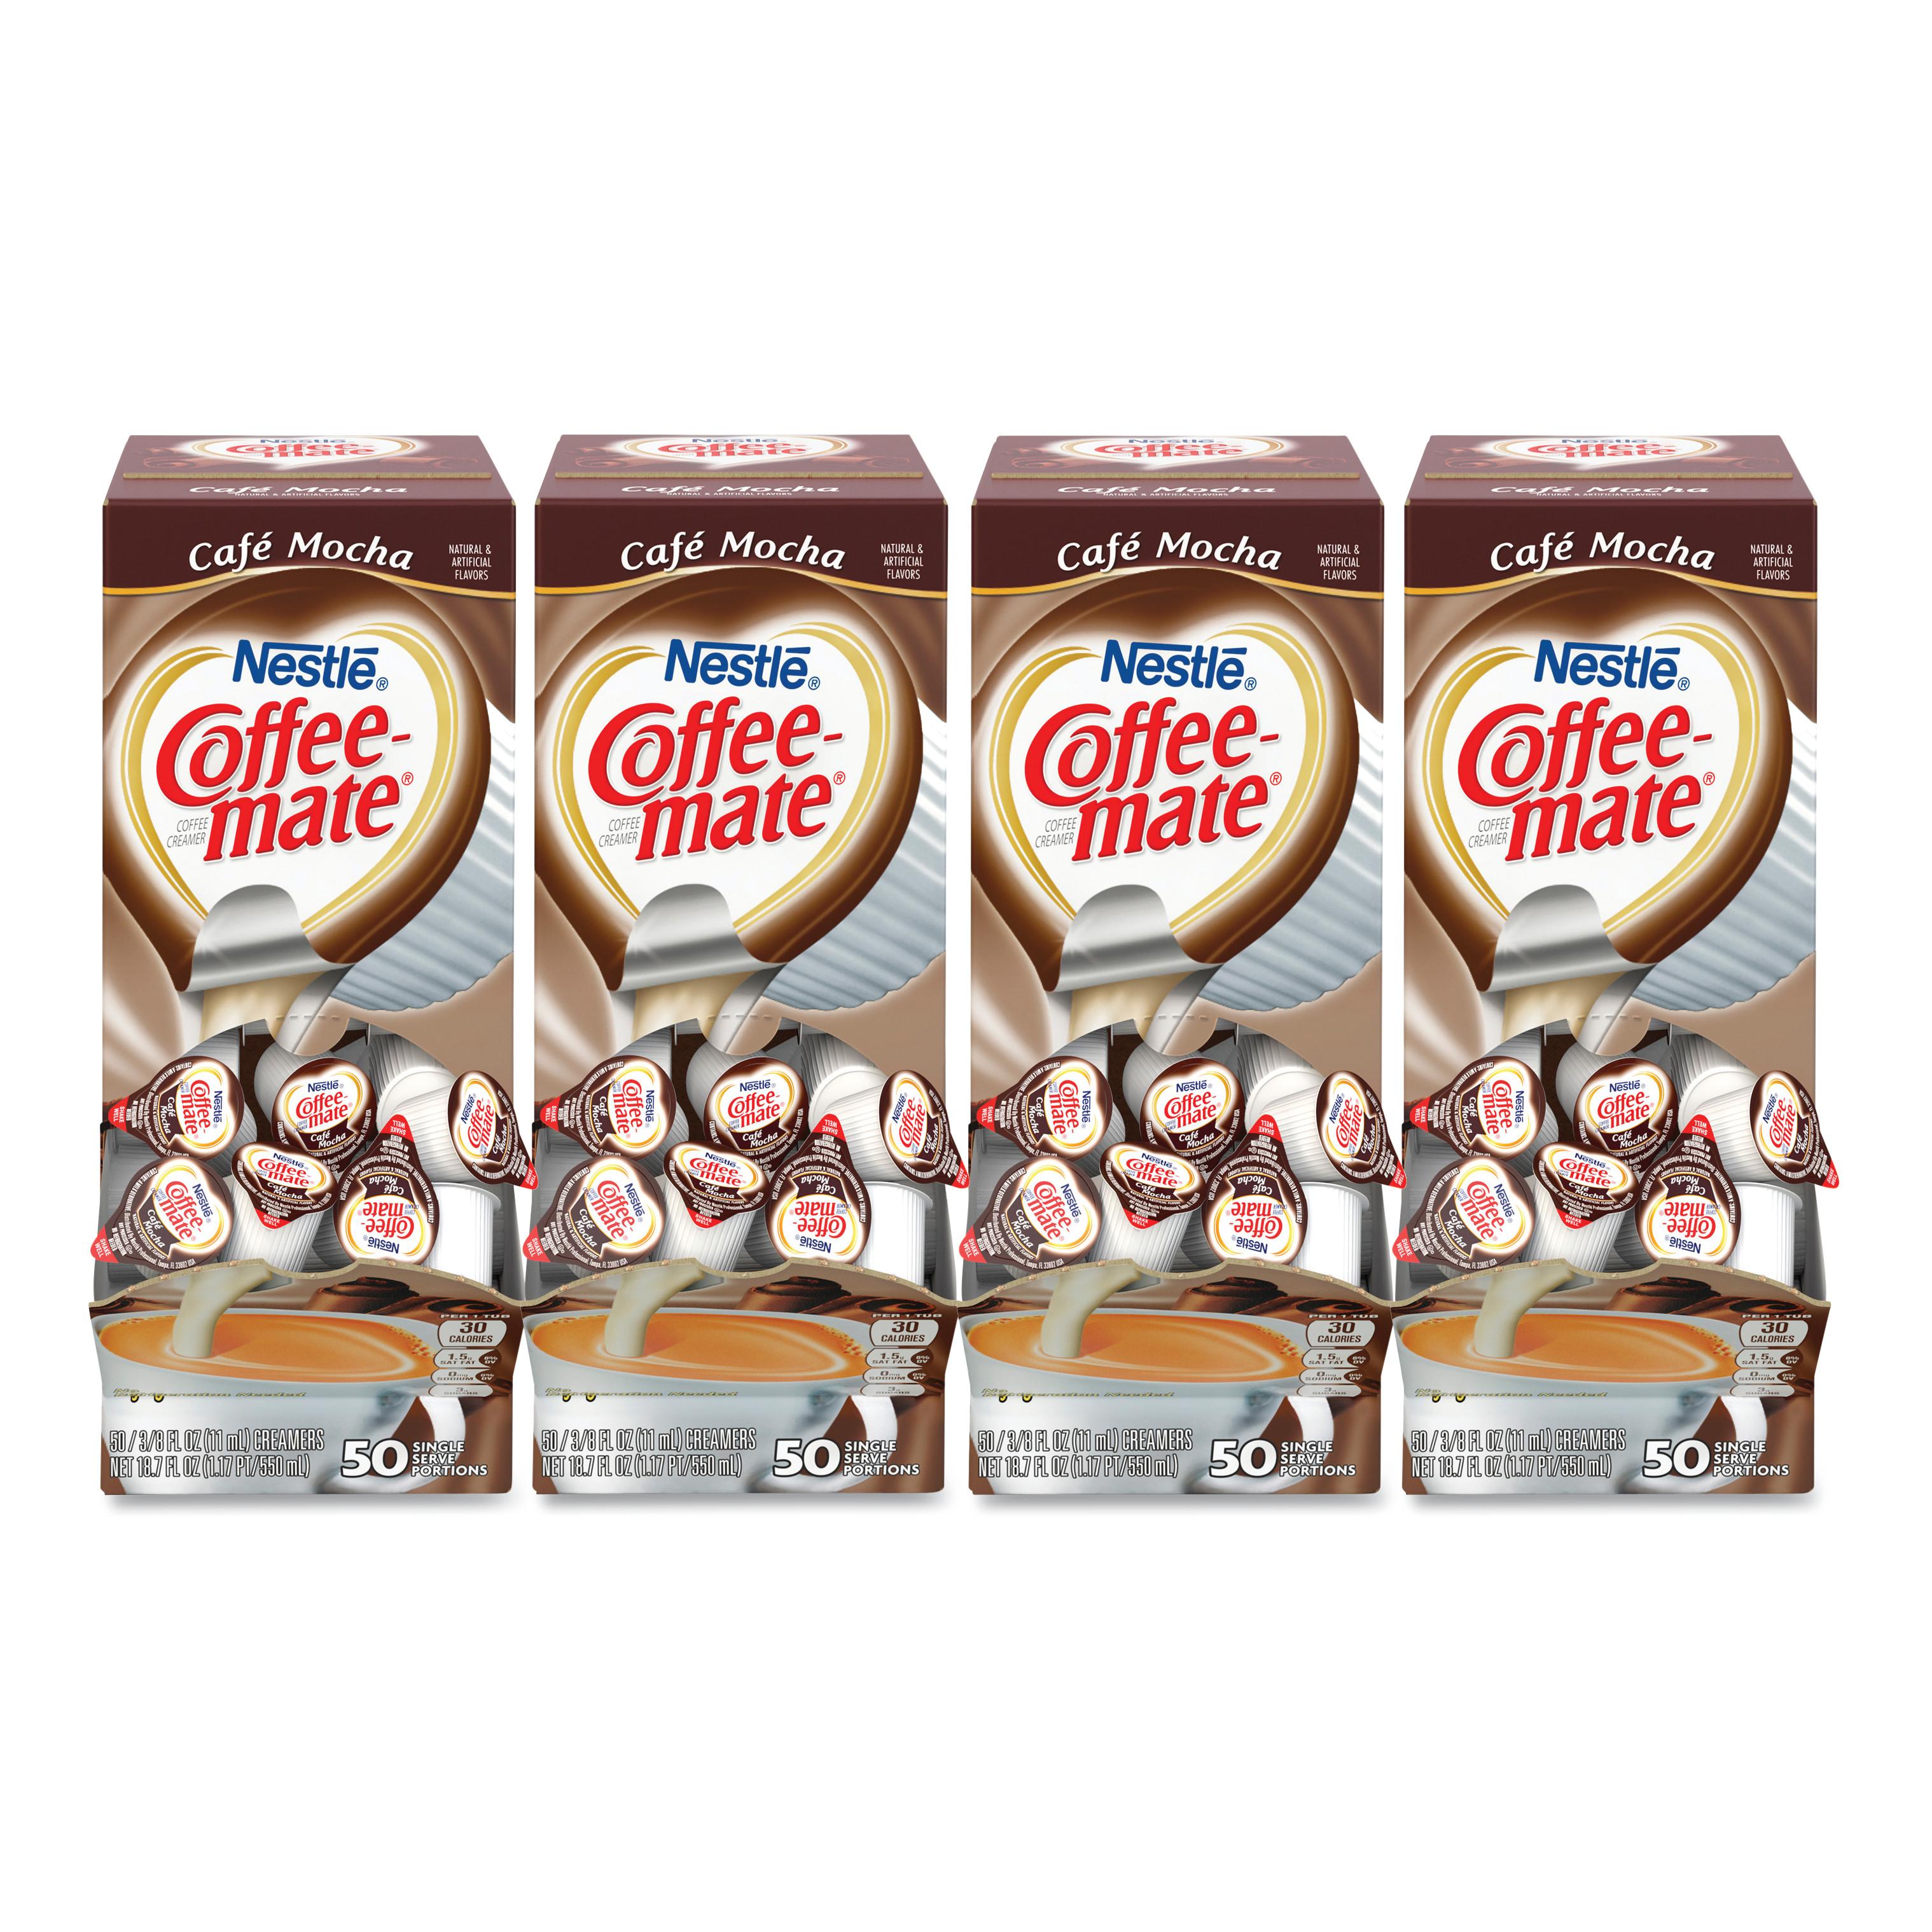 Liquid Coffee Creamer, Café Mocha, 0.375 Oz Cups, 50/Box, 4 Box/Carton